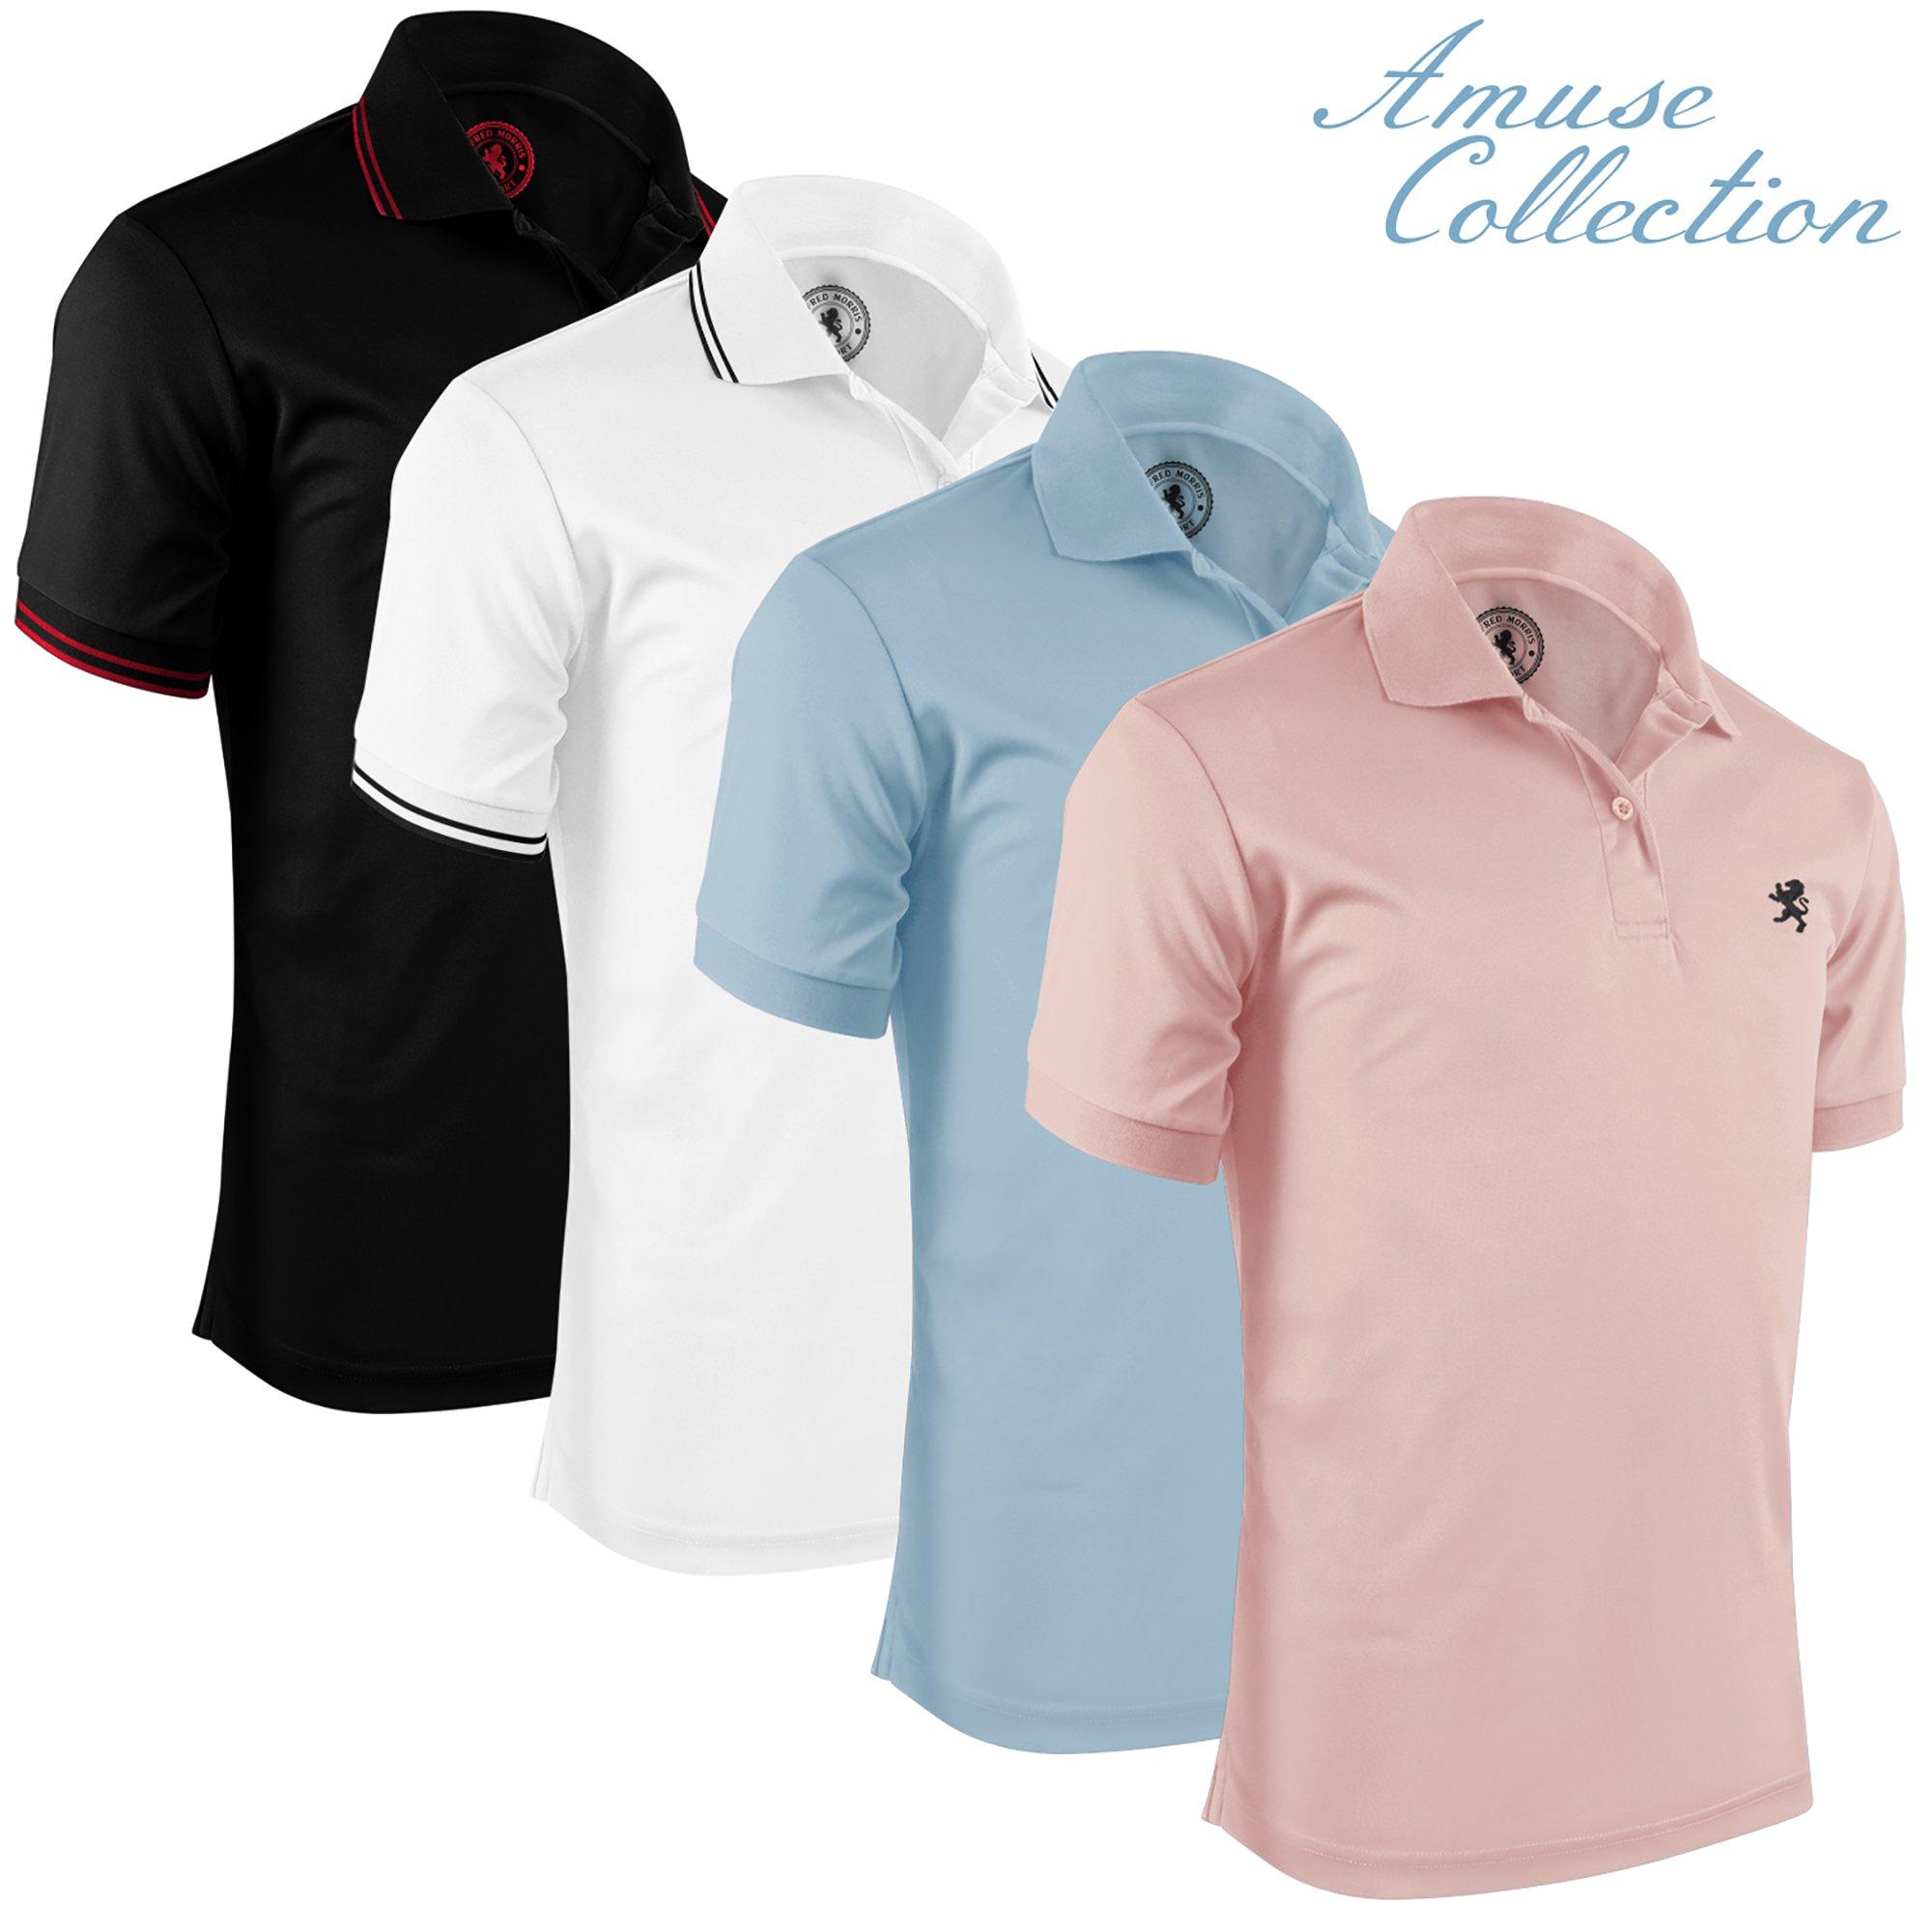 Albert Morris Short Sleeve Polo Shirts for Men - 4 Pack, Amuse, Large